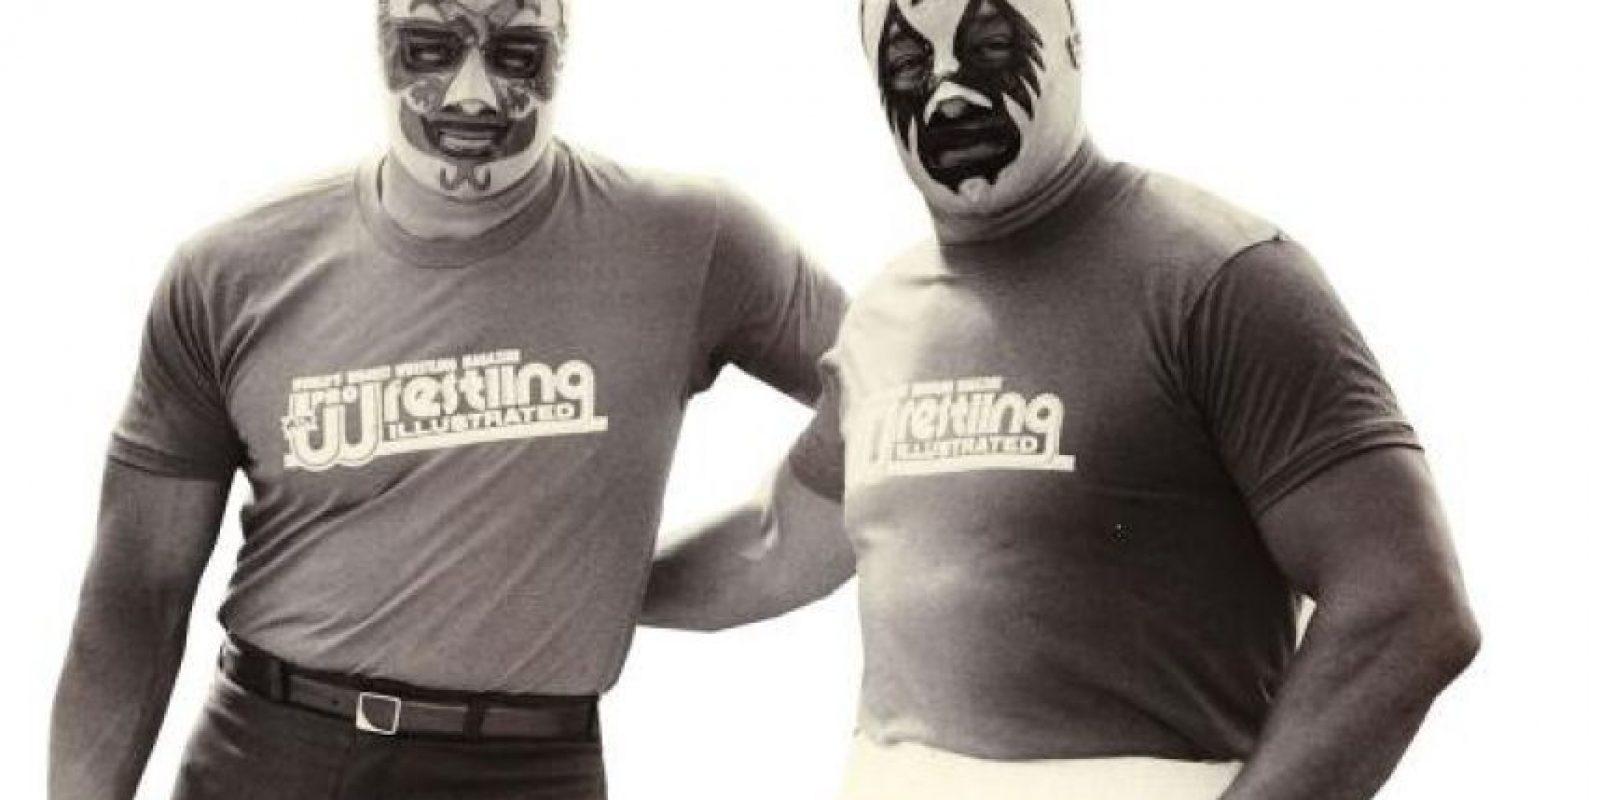 Dos Caras y Mil Mascaras. Luchadores emblemáticos mexicanos Foto:WWE